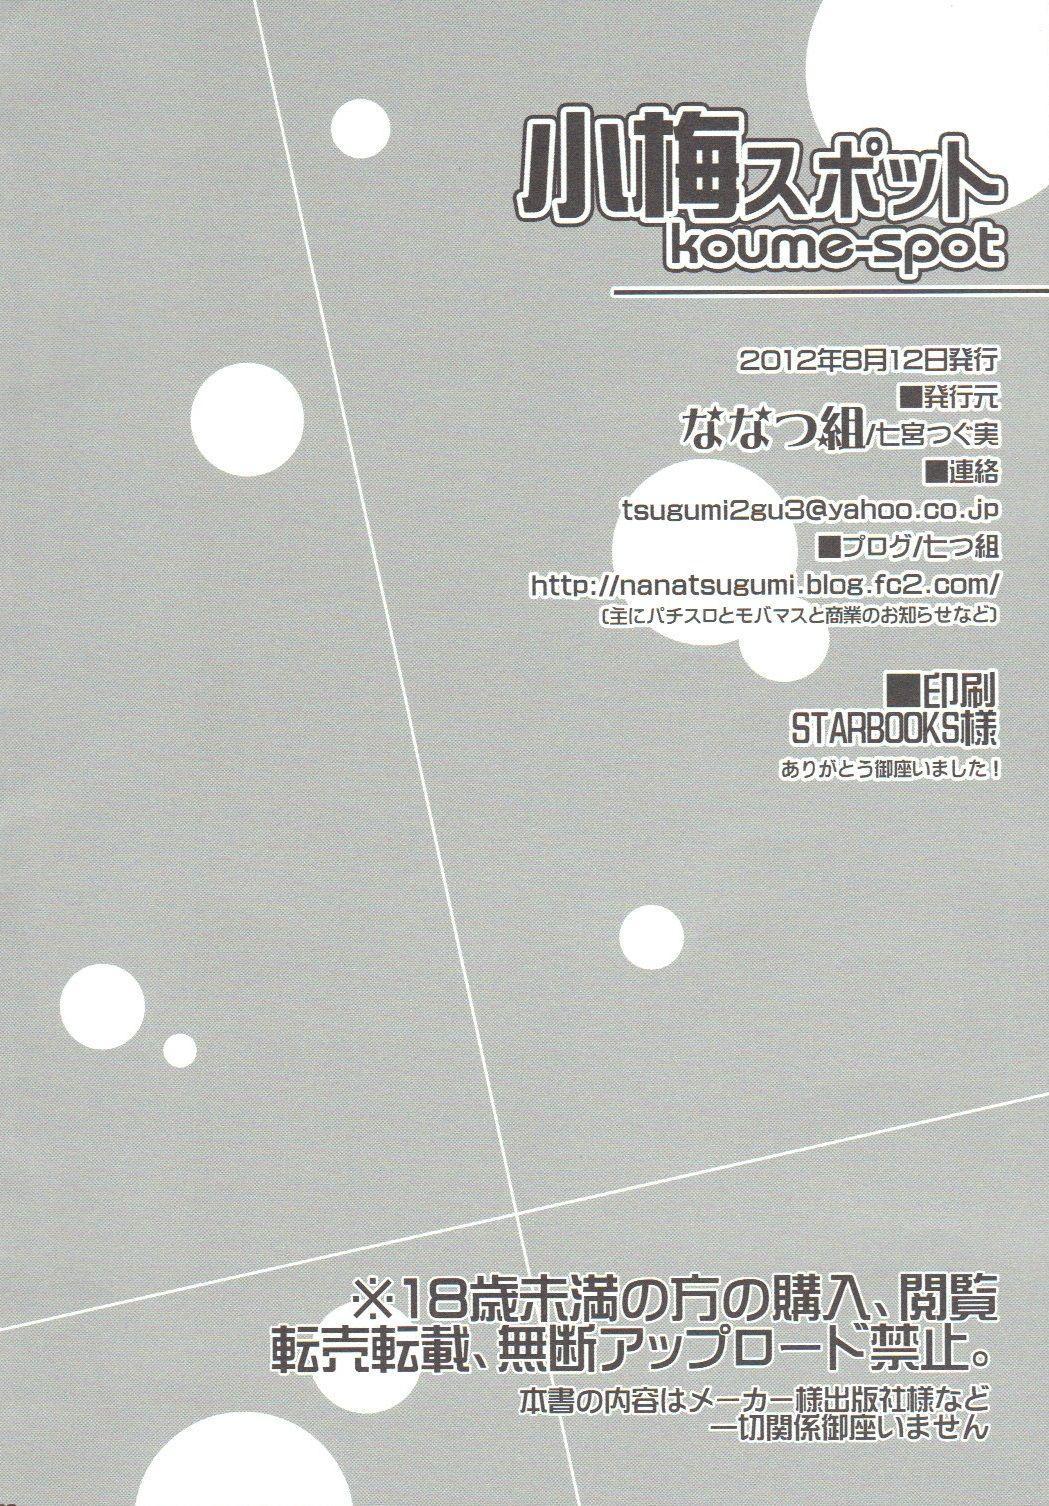 Koume-Spot 20